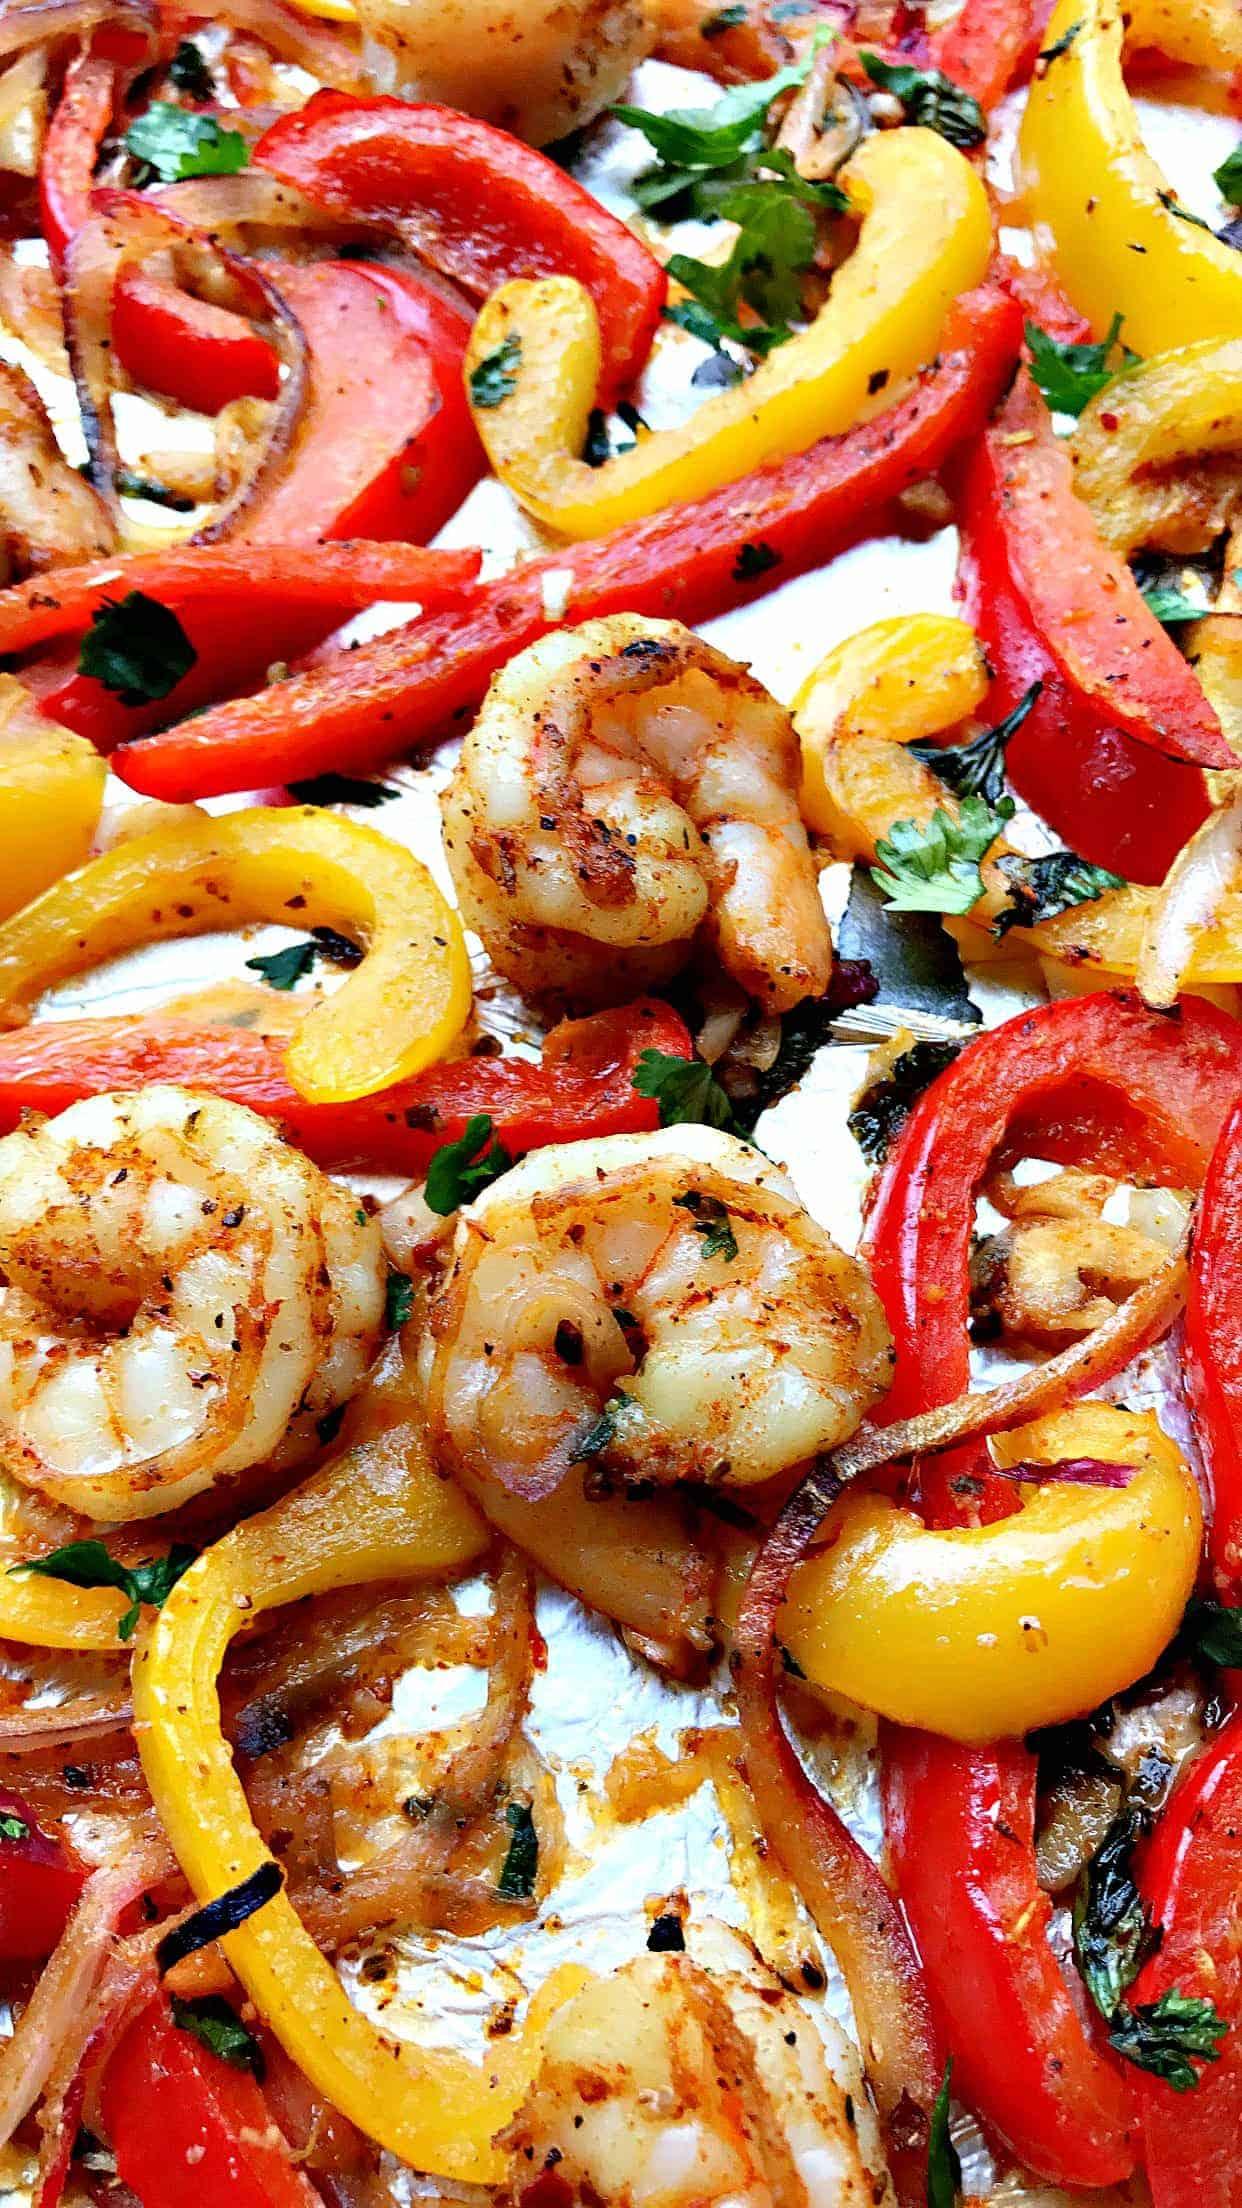 20-Minute Low-Carb One Sheet Pan Shrimp Fajitas - photo#8